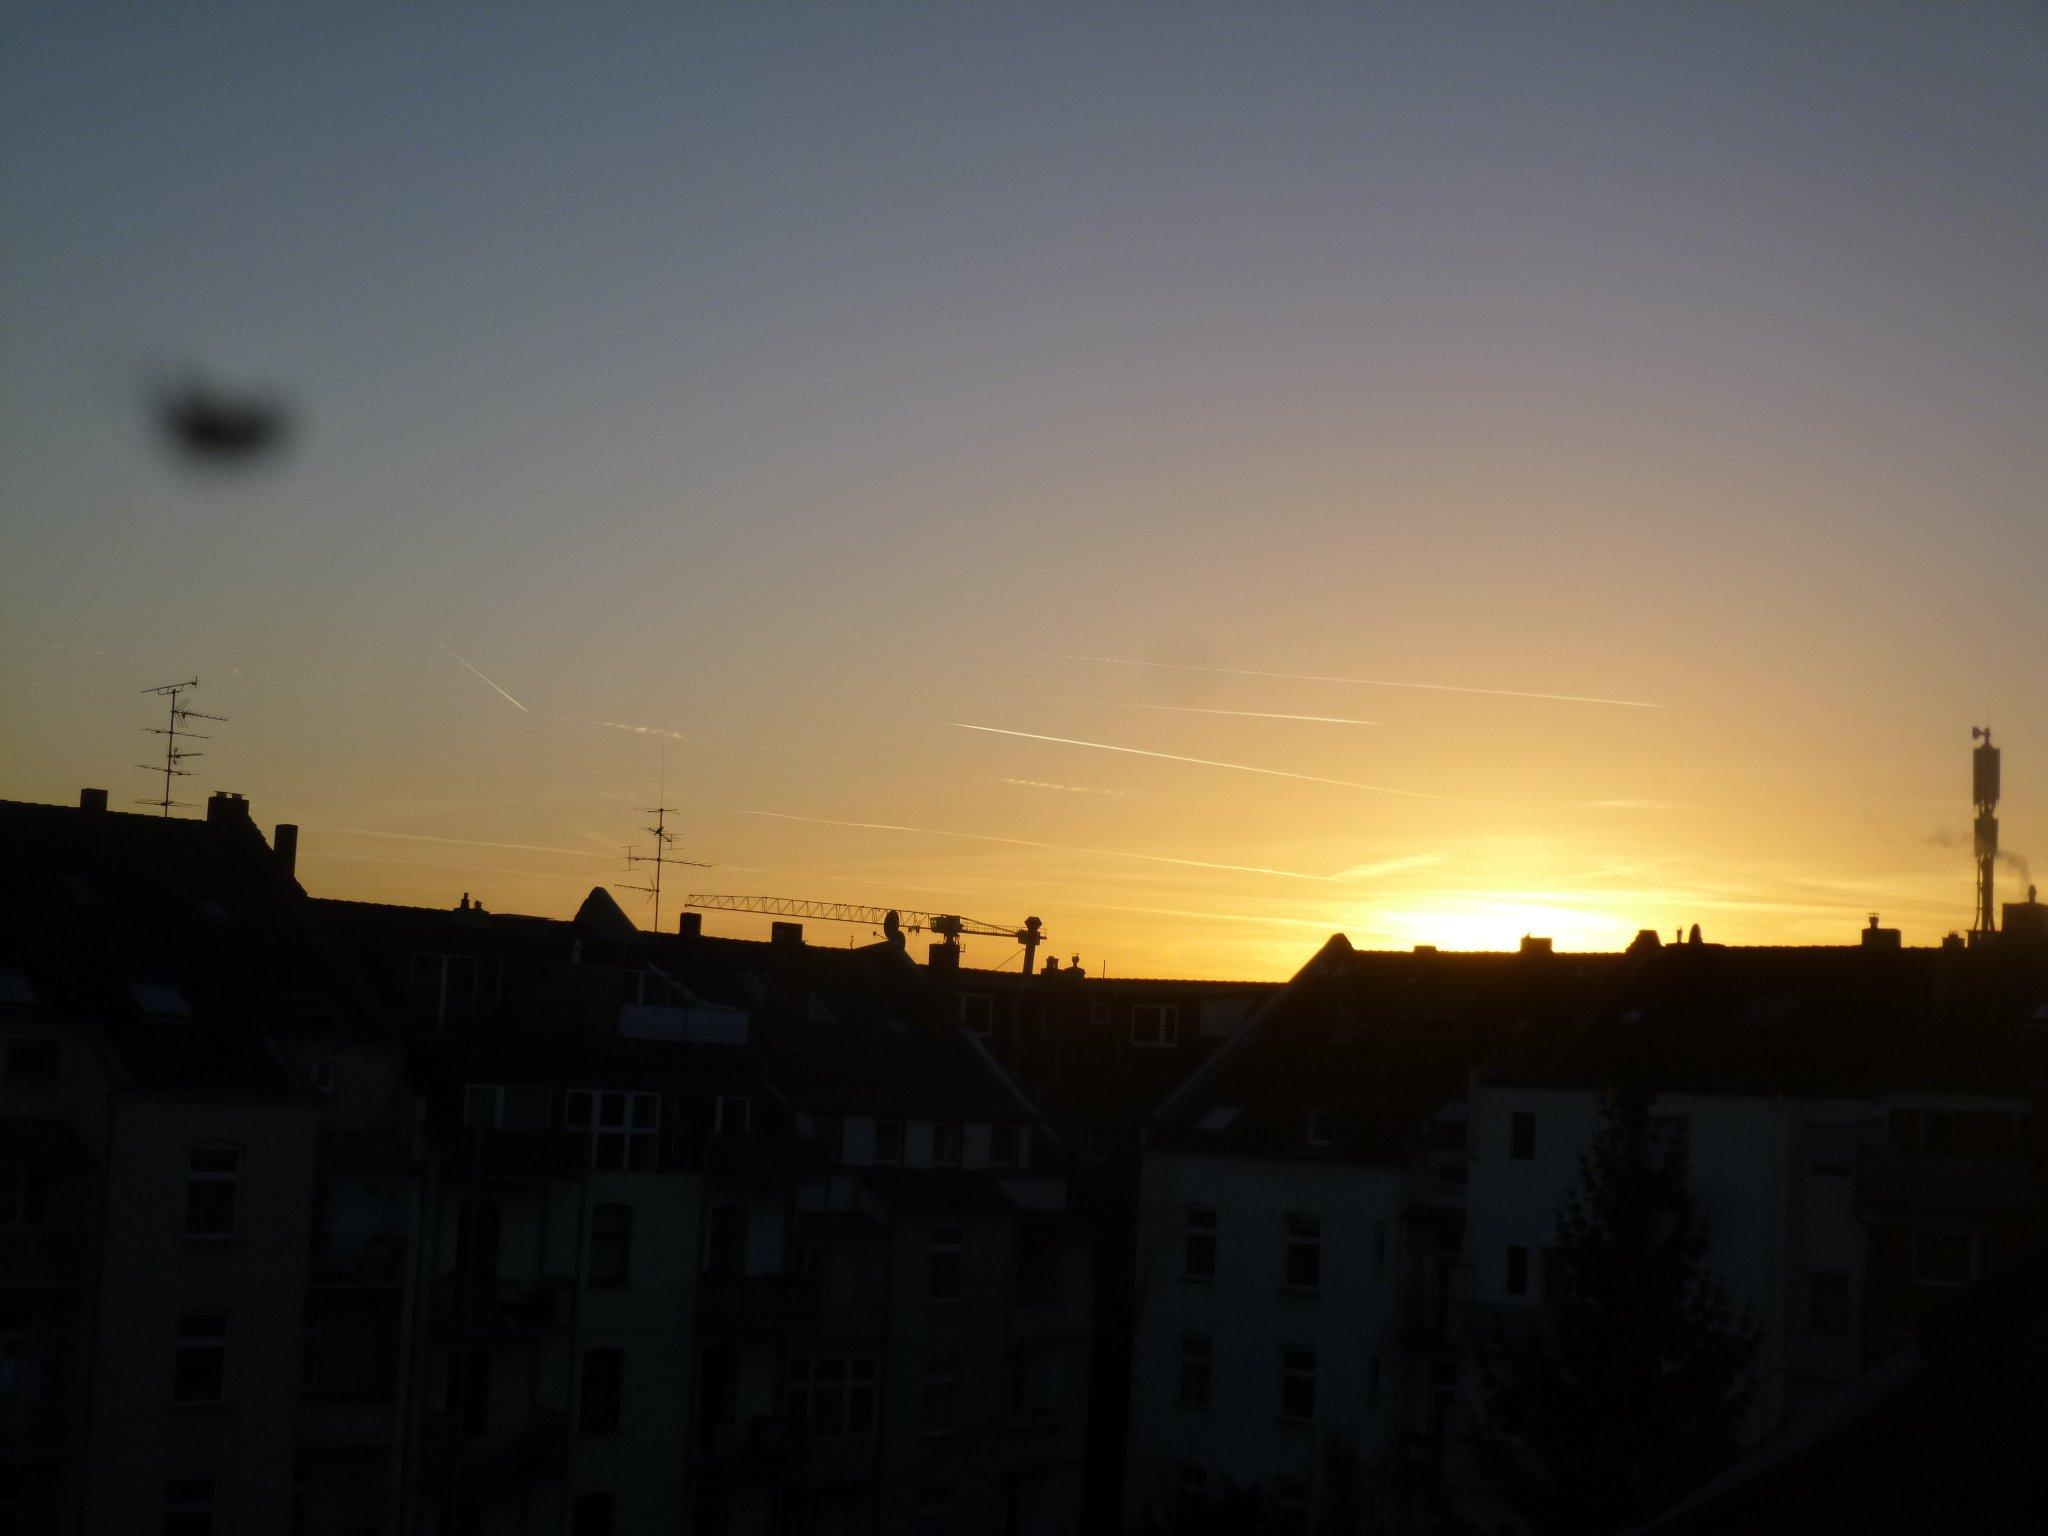 Flieger in den Sonnenuntergang